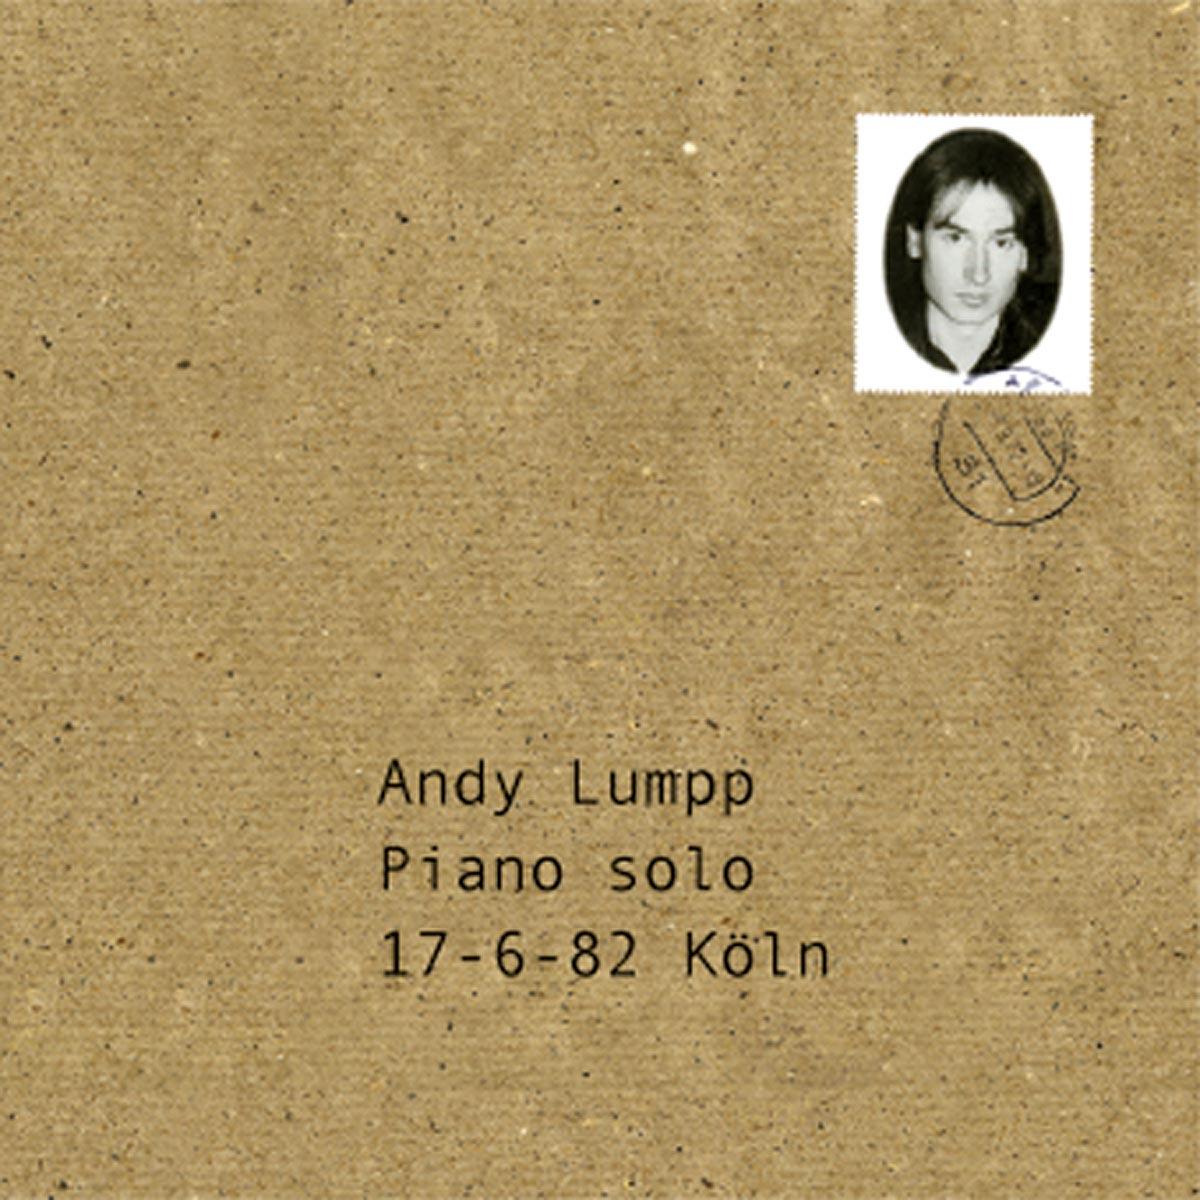 Andy Lumpp